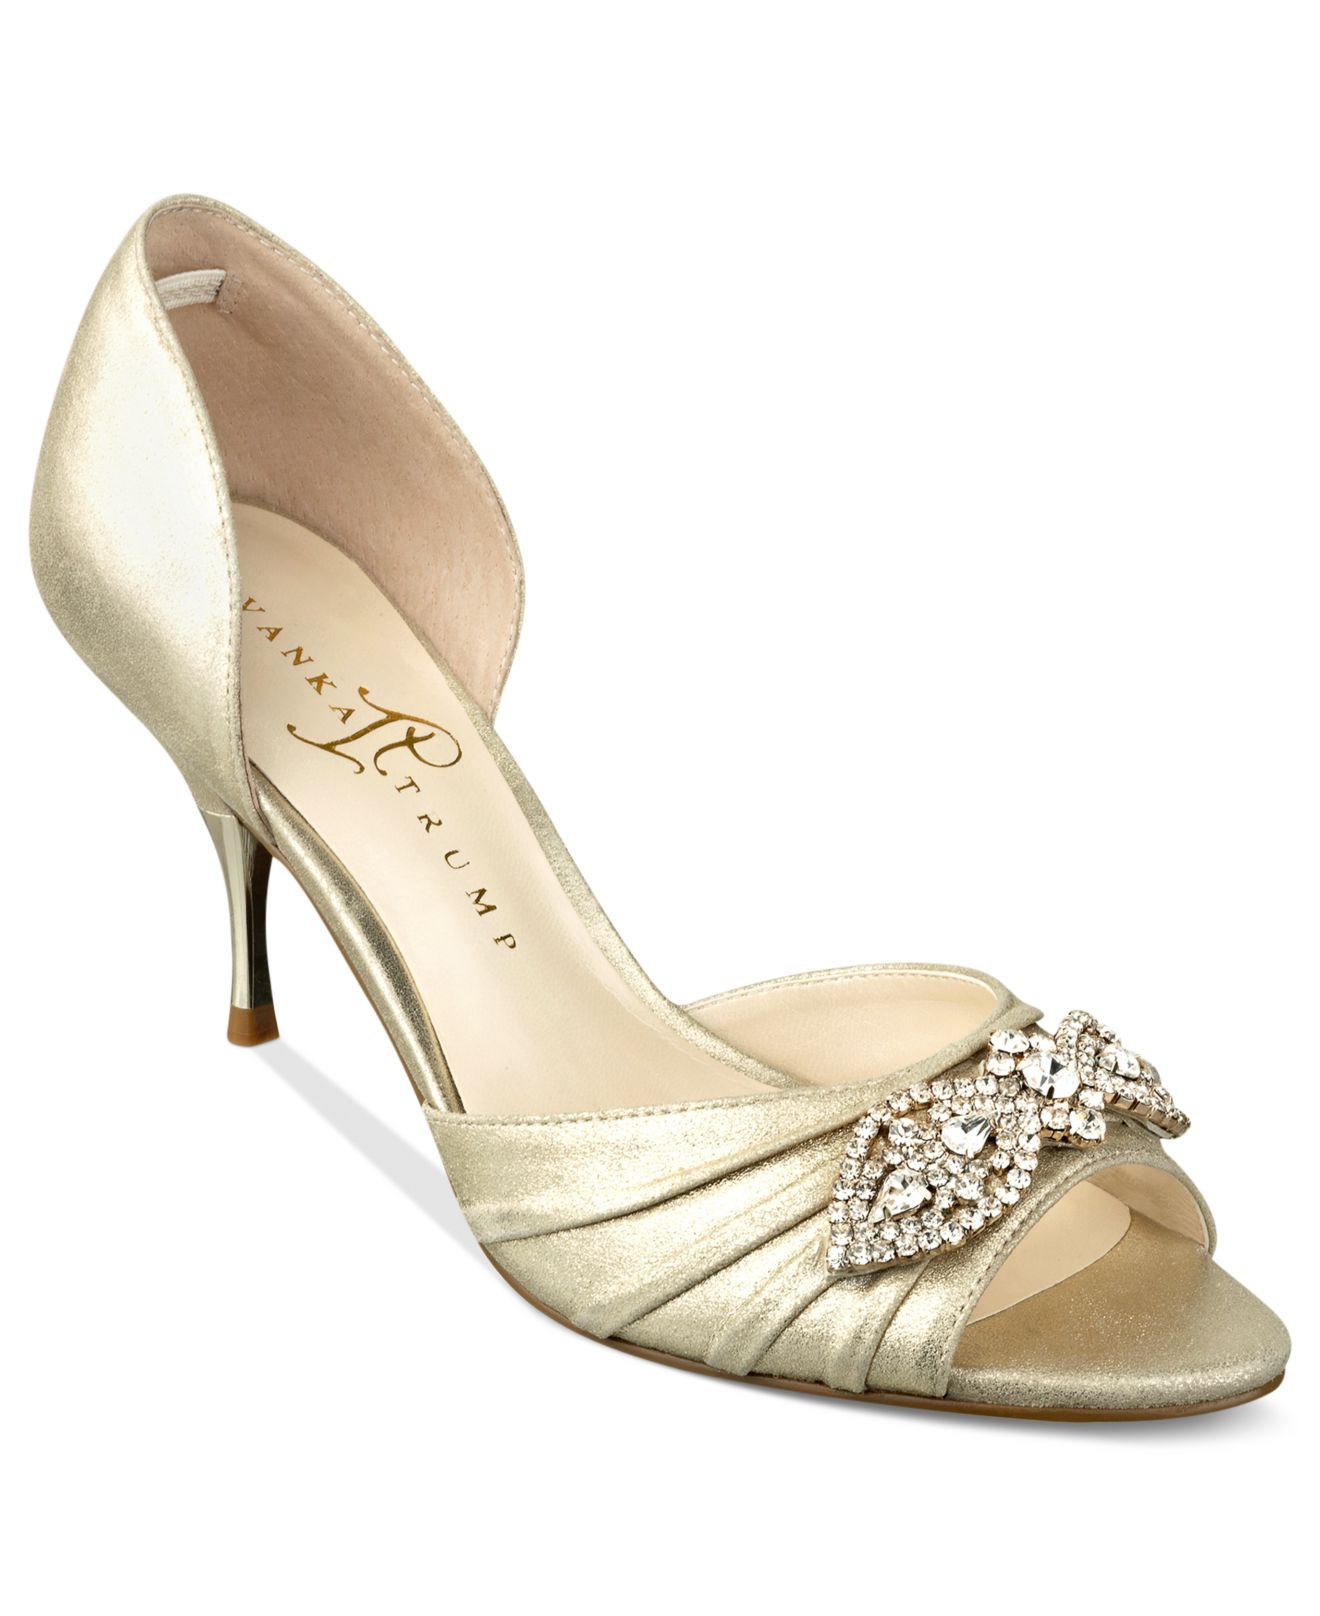 Lyst - Ivanka trump Na... Ivanka Trump Shoes Online